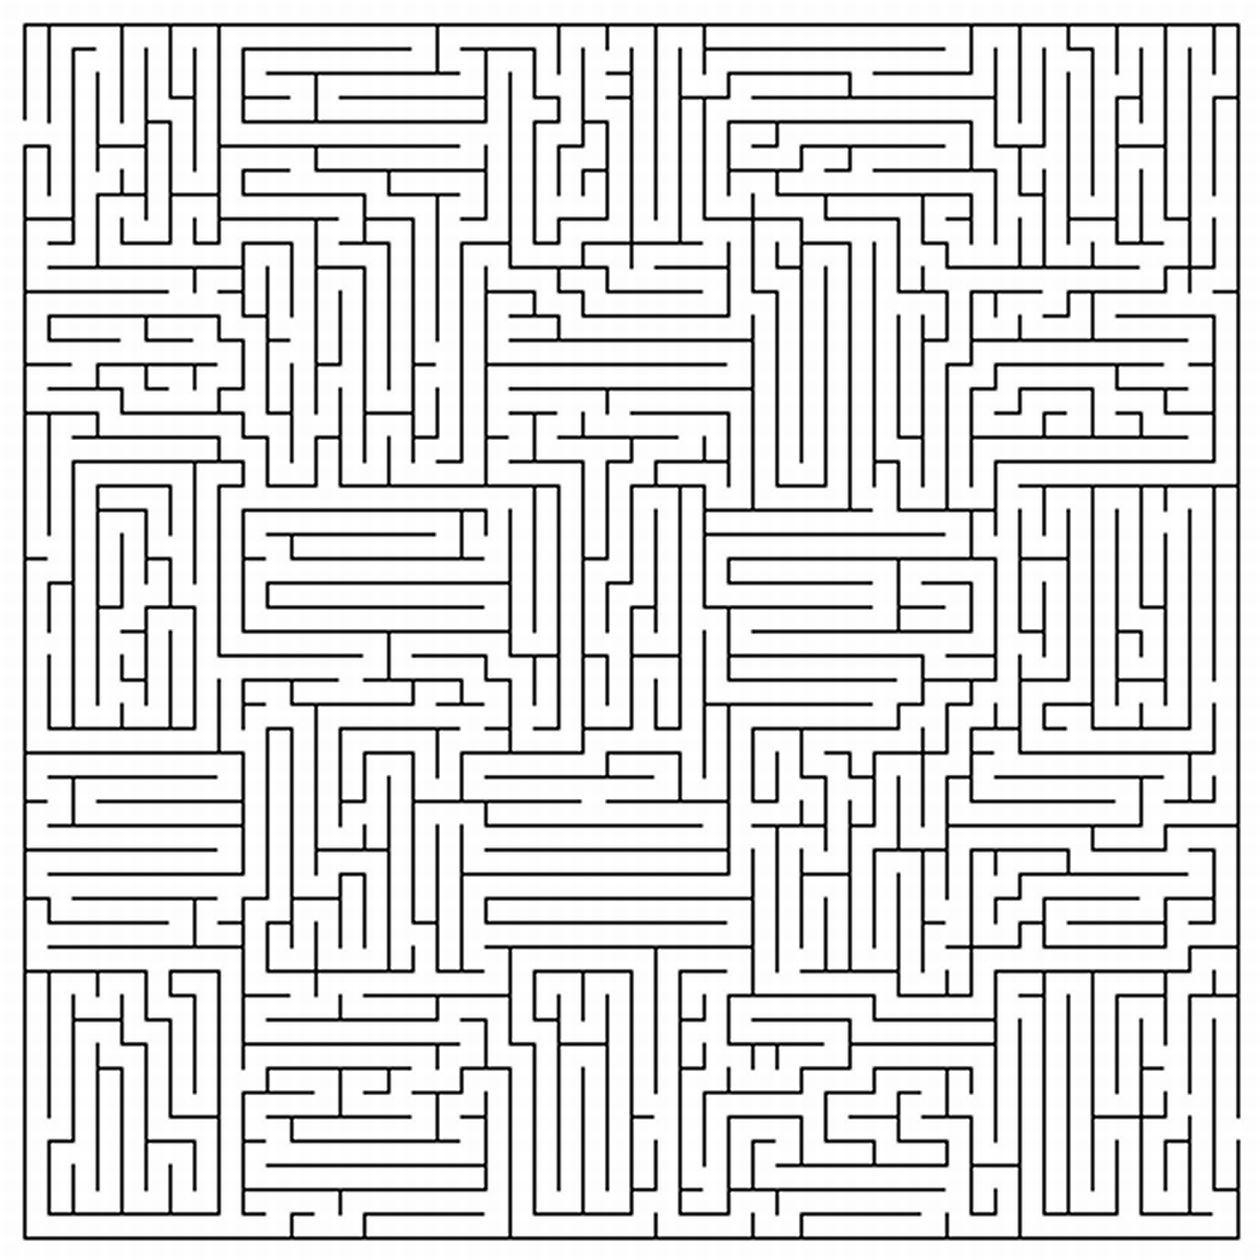 malvorlagen labyrinth bilder  aglhk